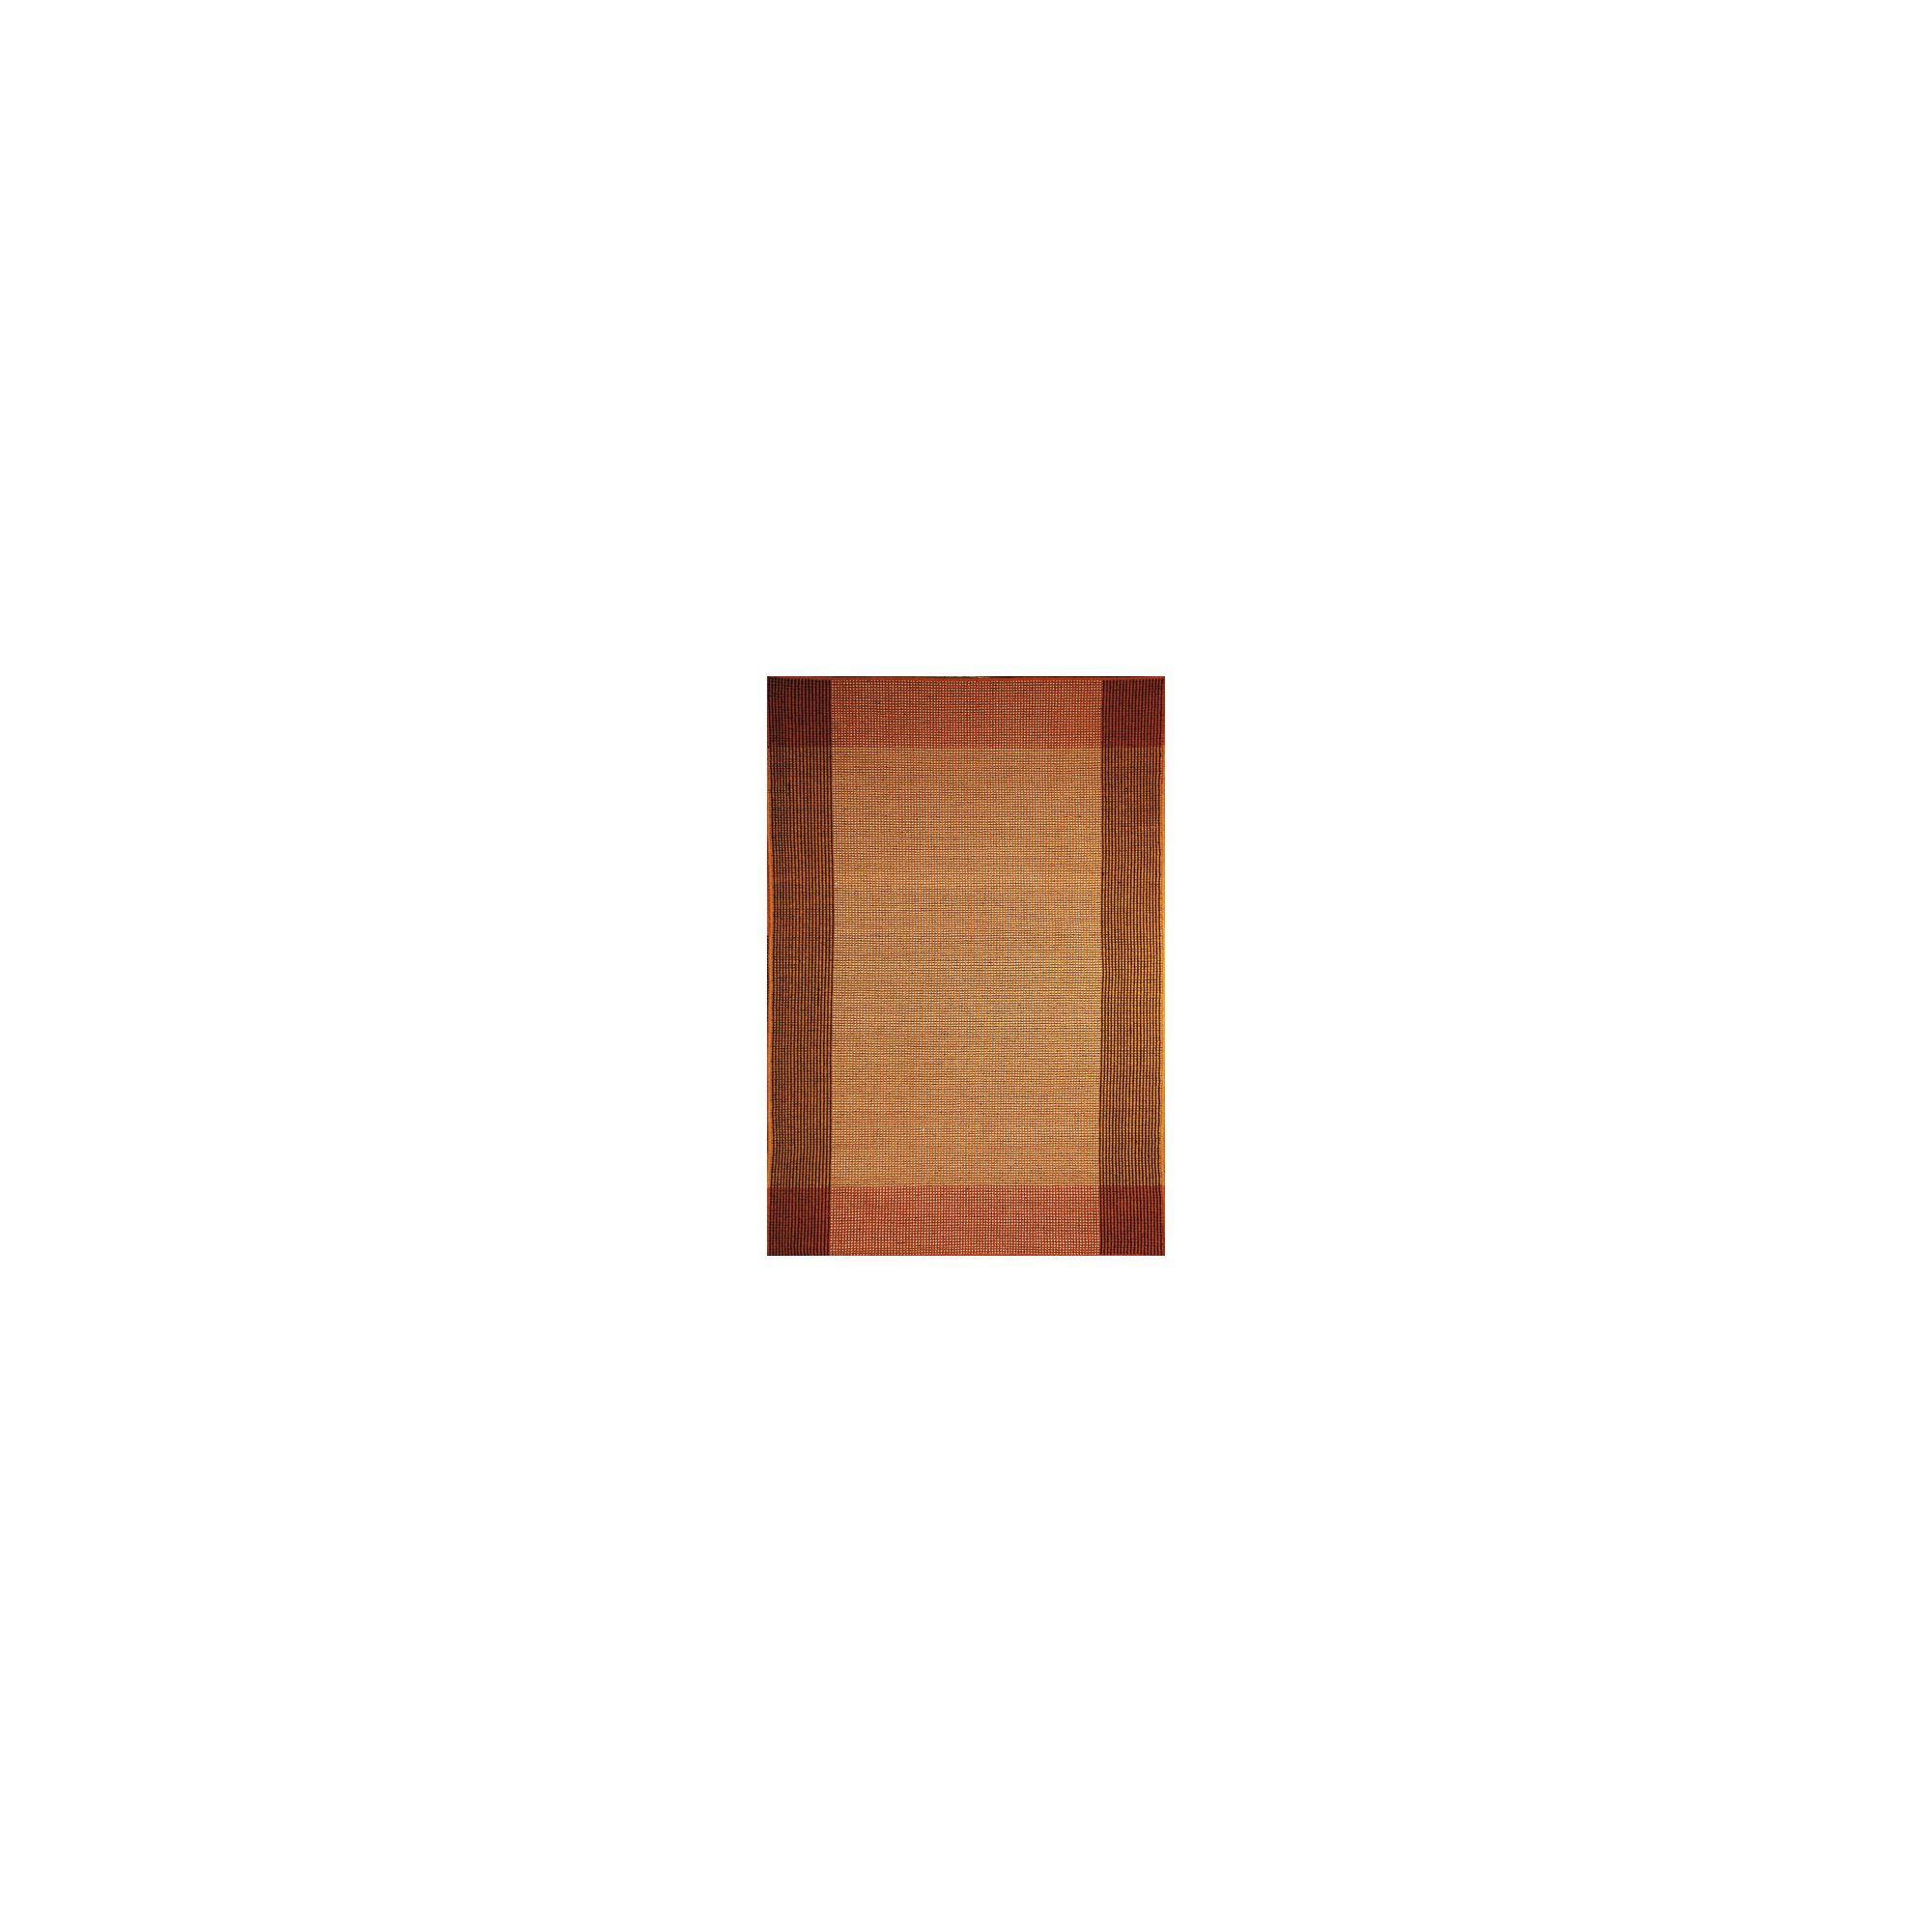 InRUGS Ellora Orange Woven Rug - 230cm x 160cm (7 ft 6.5 in x 5 ft 3 in)